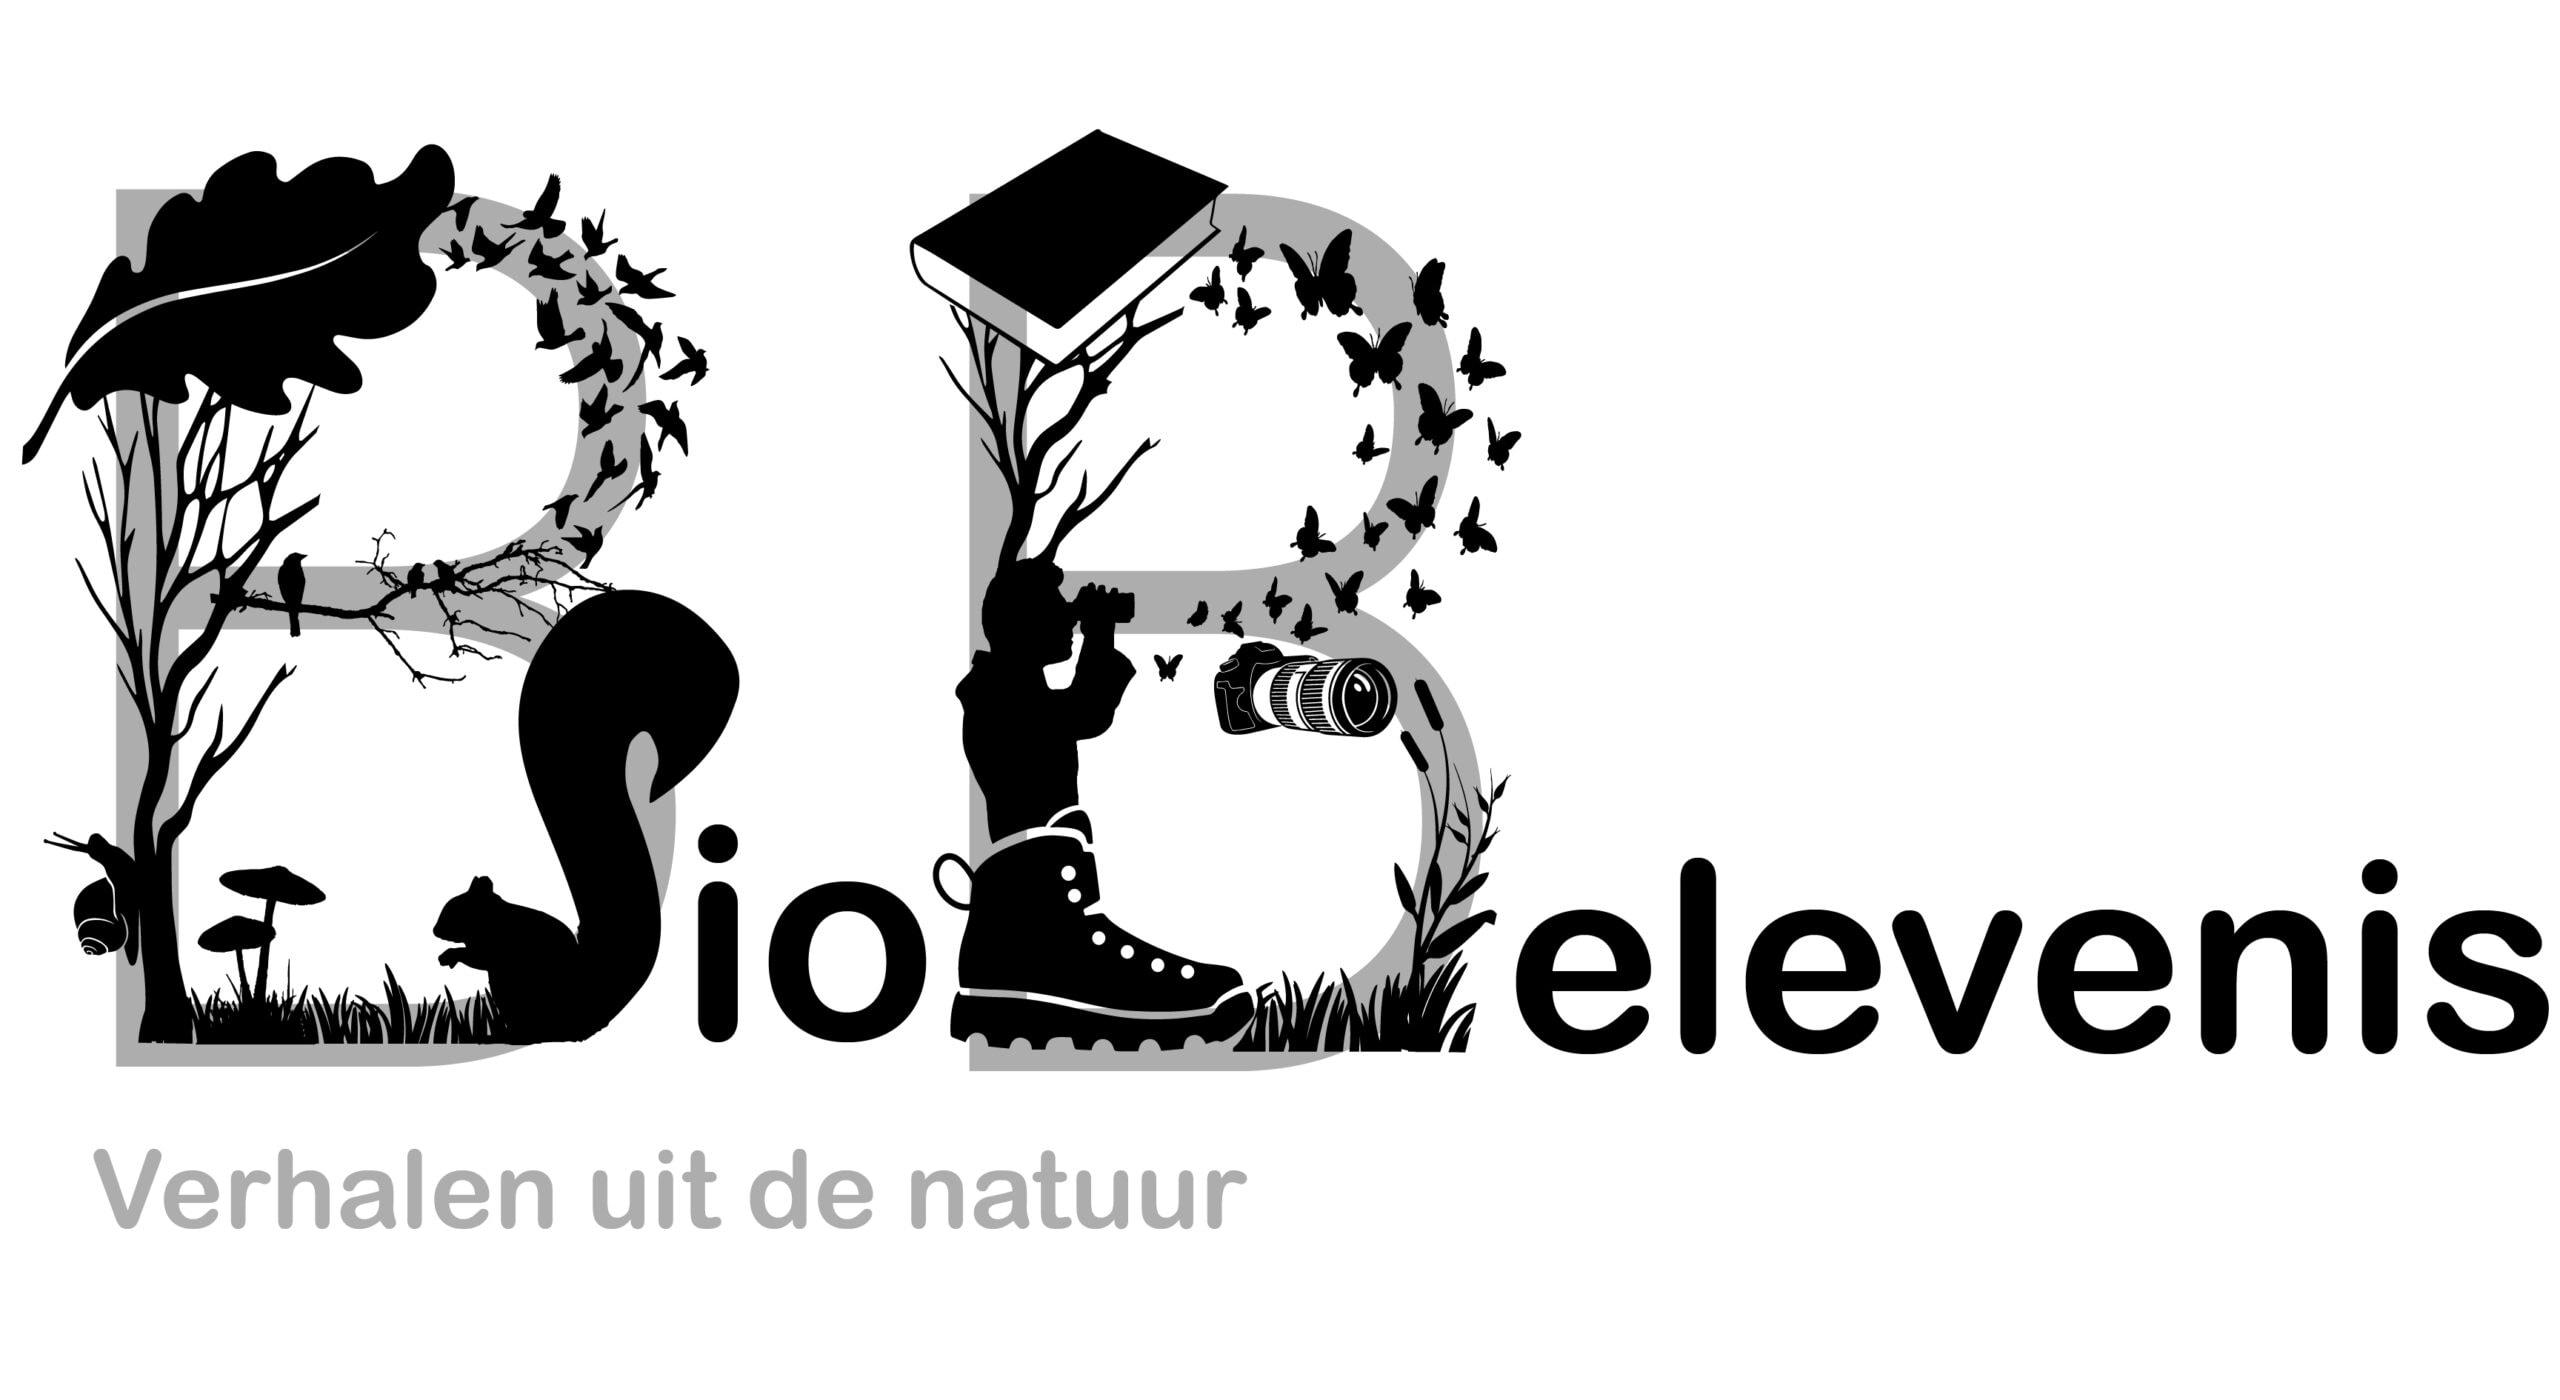 BioBelevenis